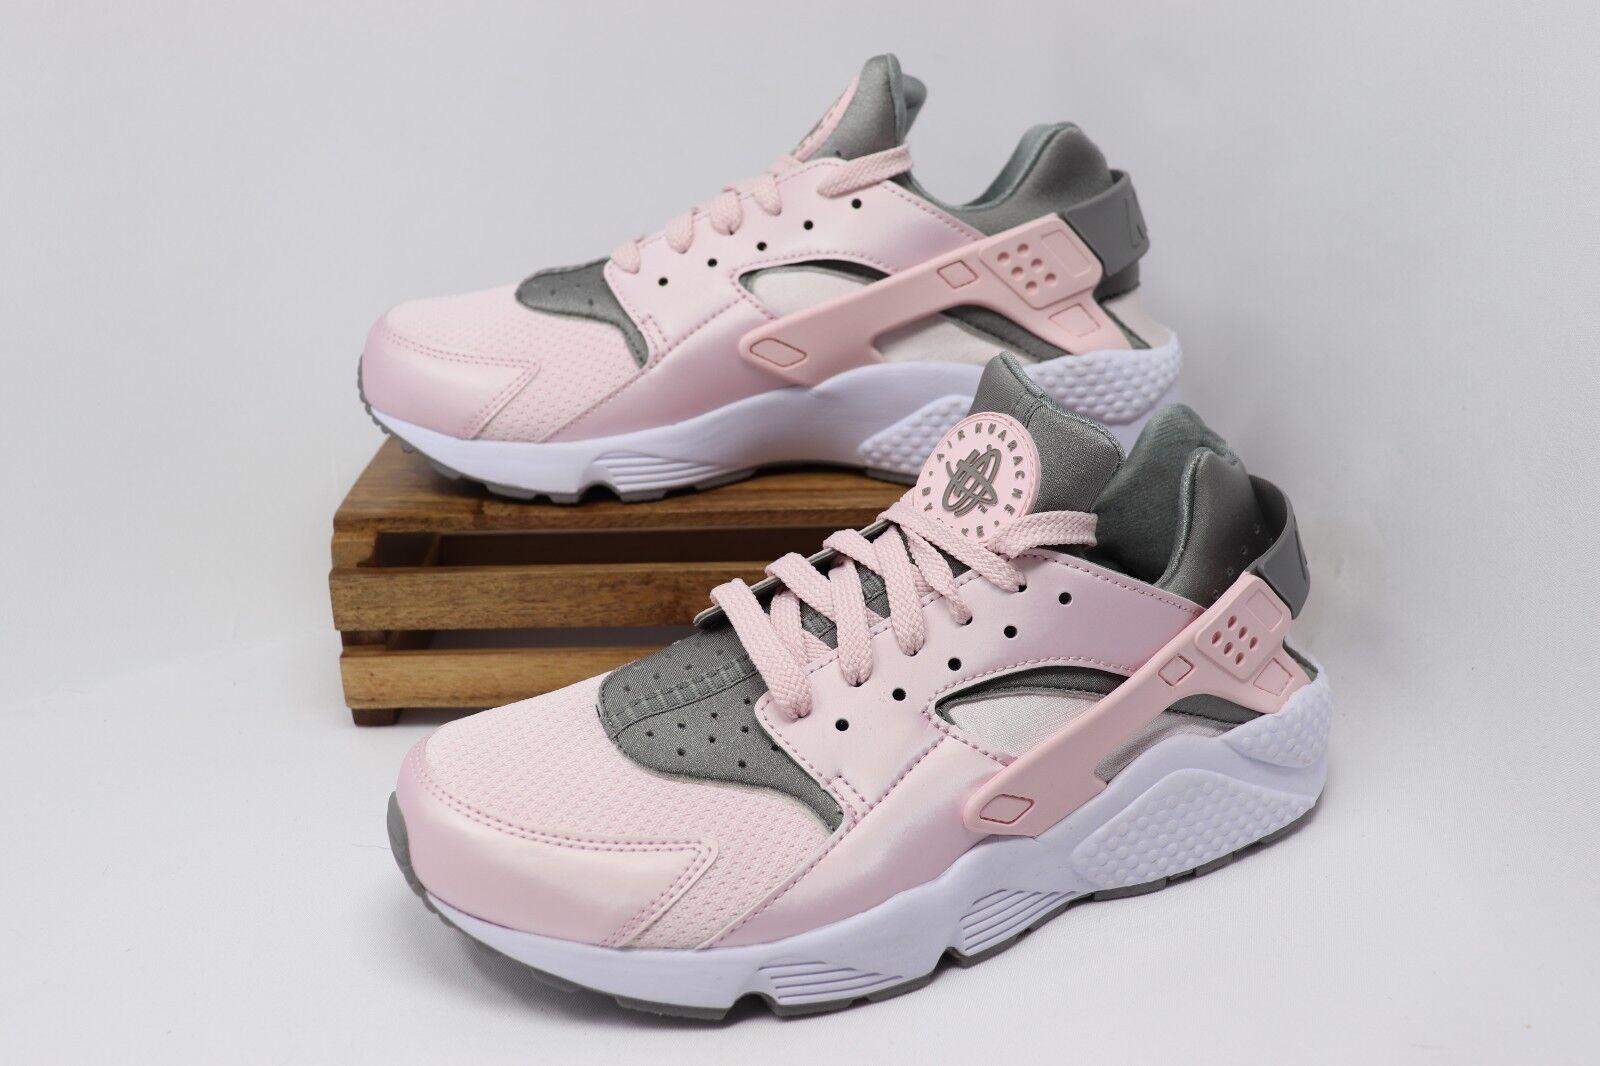 97ceb25b3286 Nike Air Huarache Running Shoes Arctic Pink Dusty White Sz 11 ...